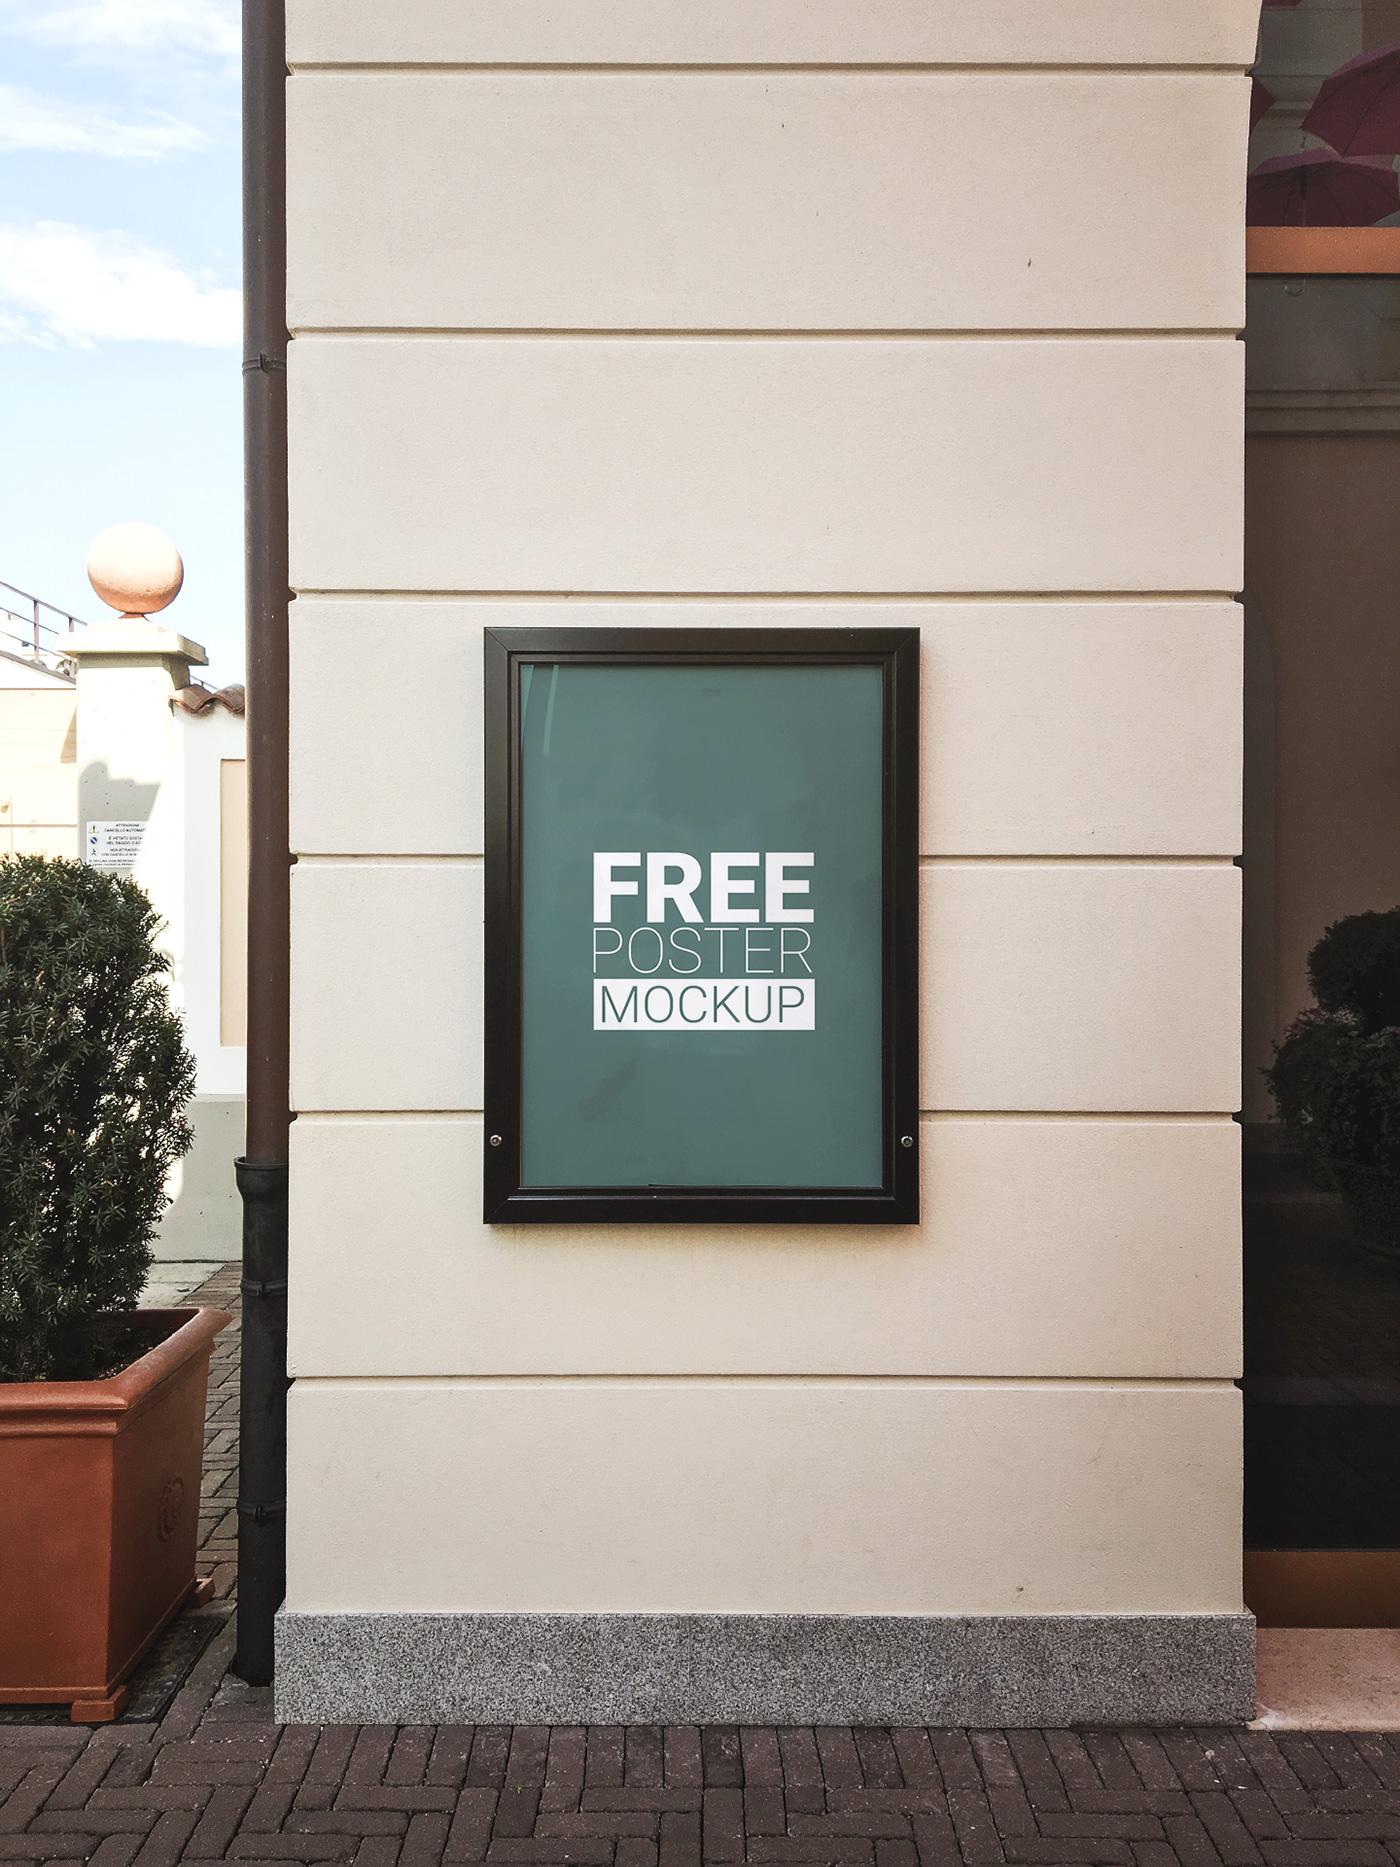 Free Outdoor Poster Mockup Psd Psdblast